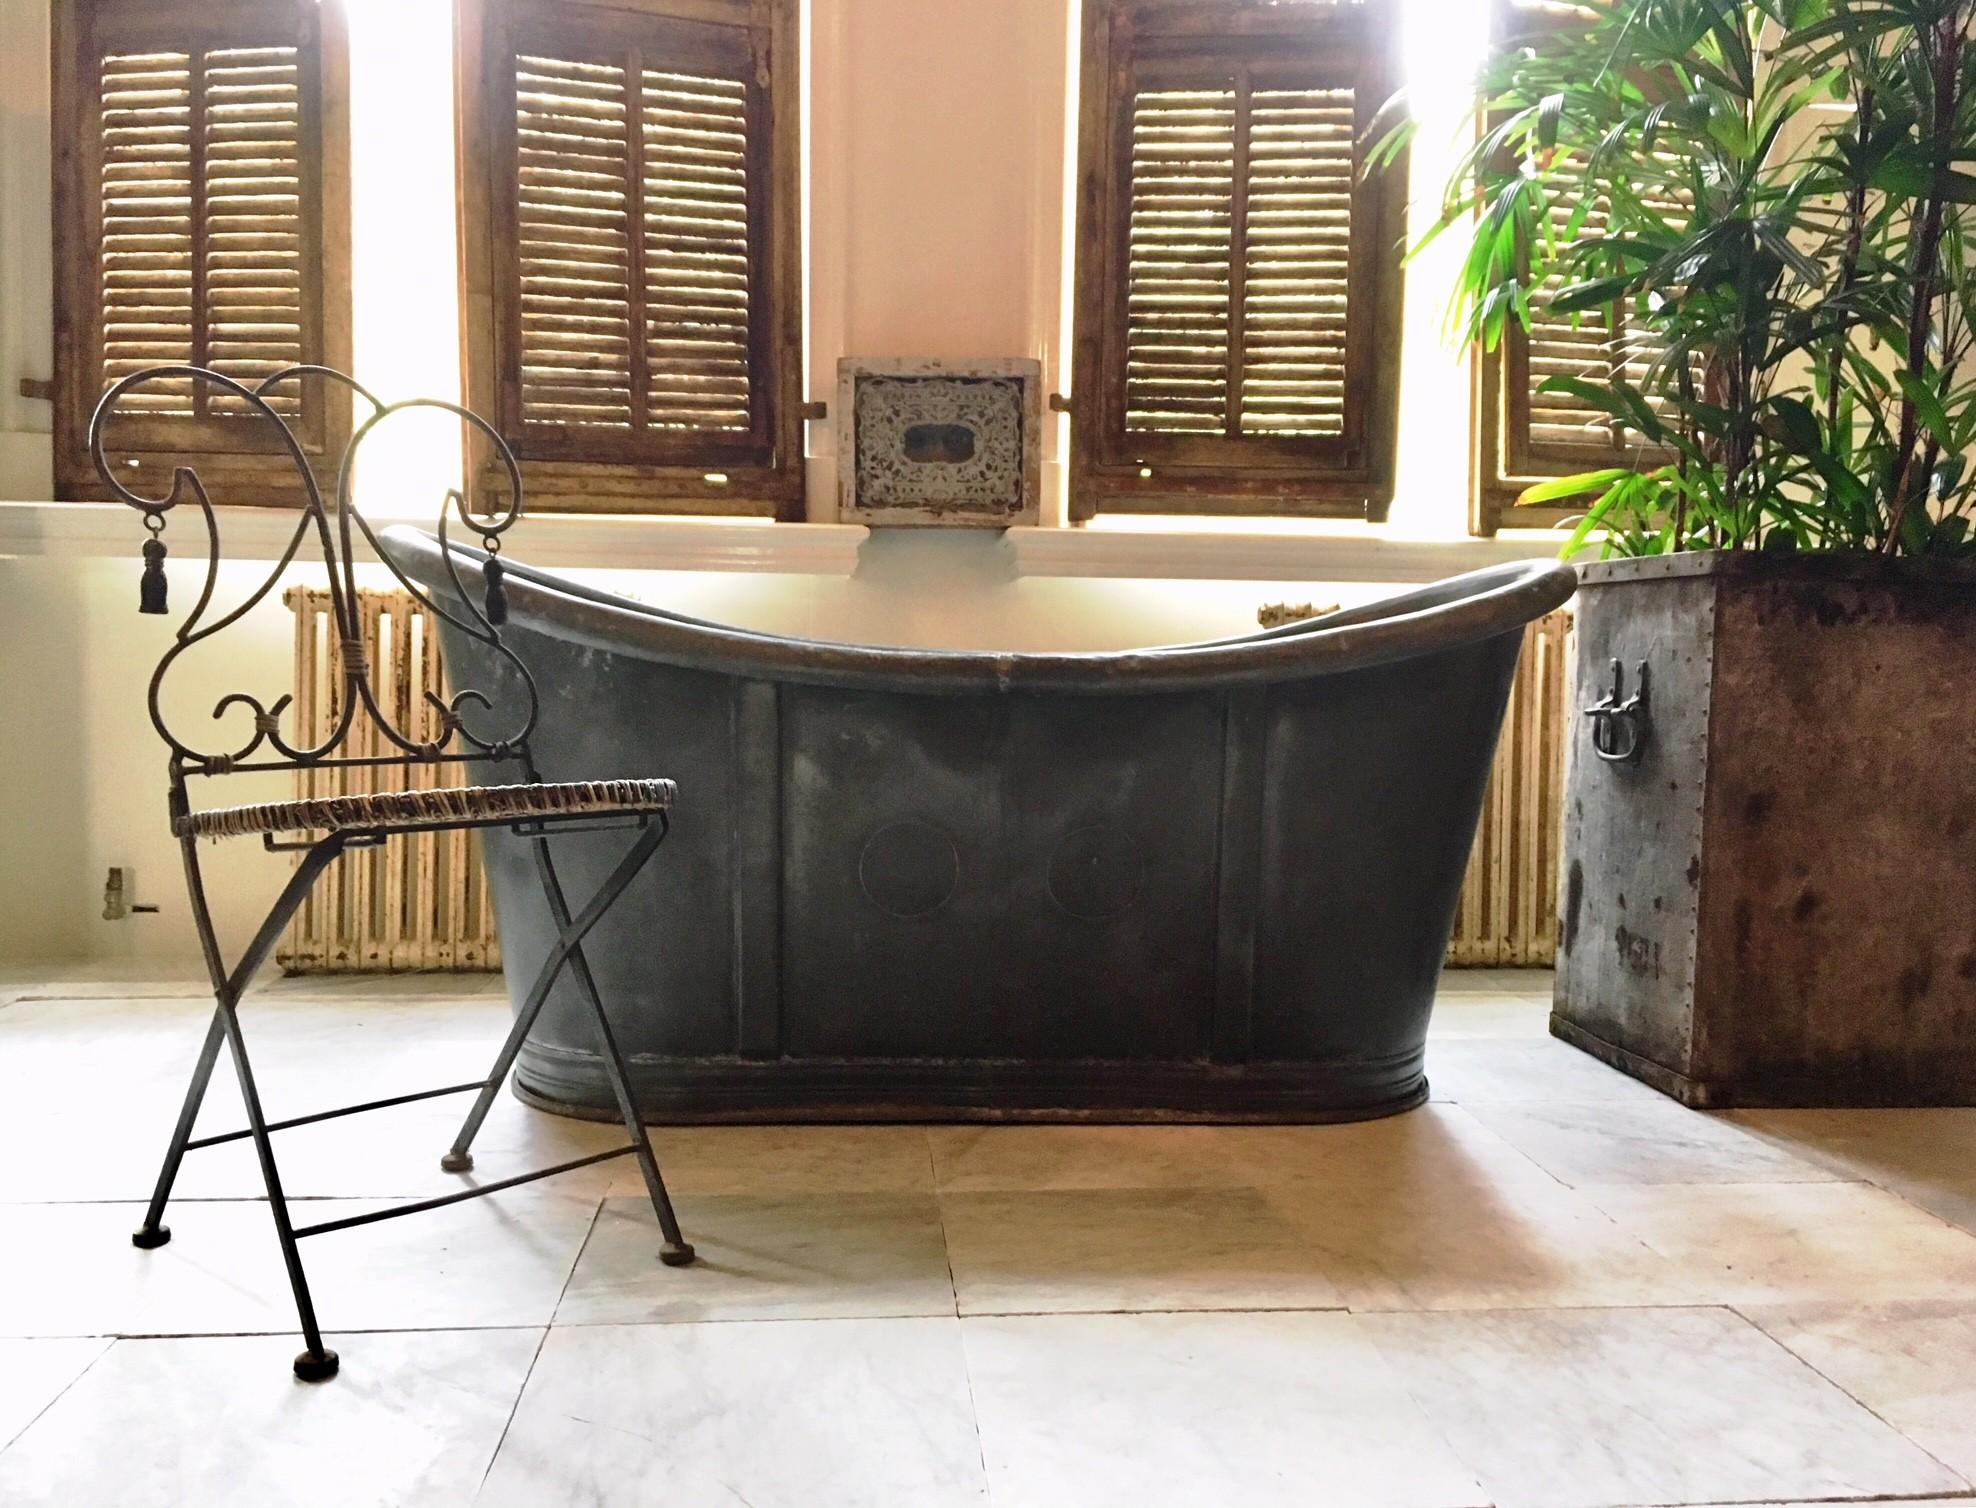 Antique 19th century bathtub of zinc